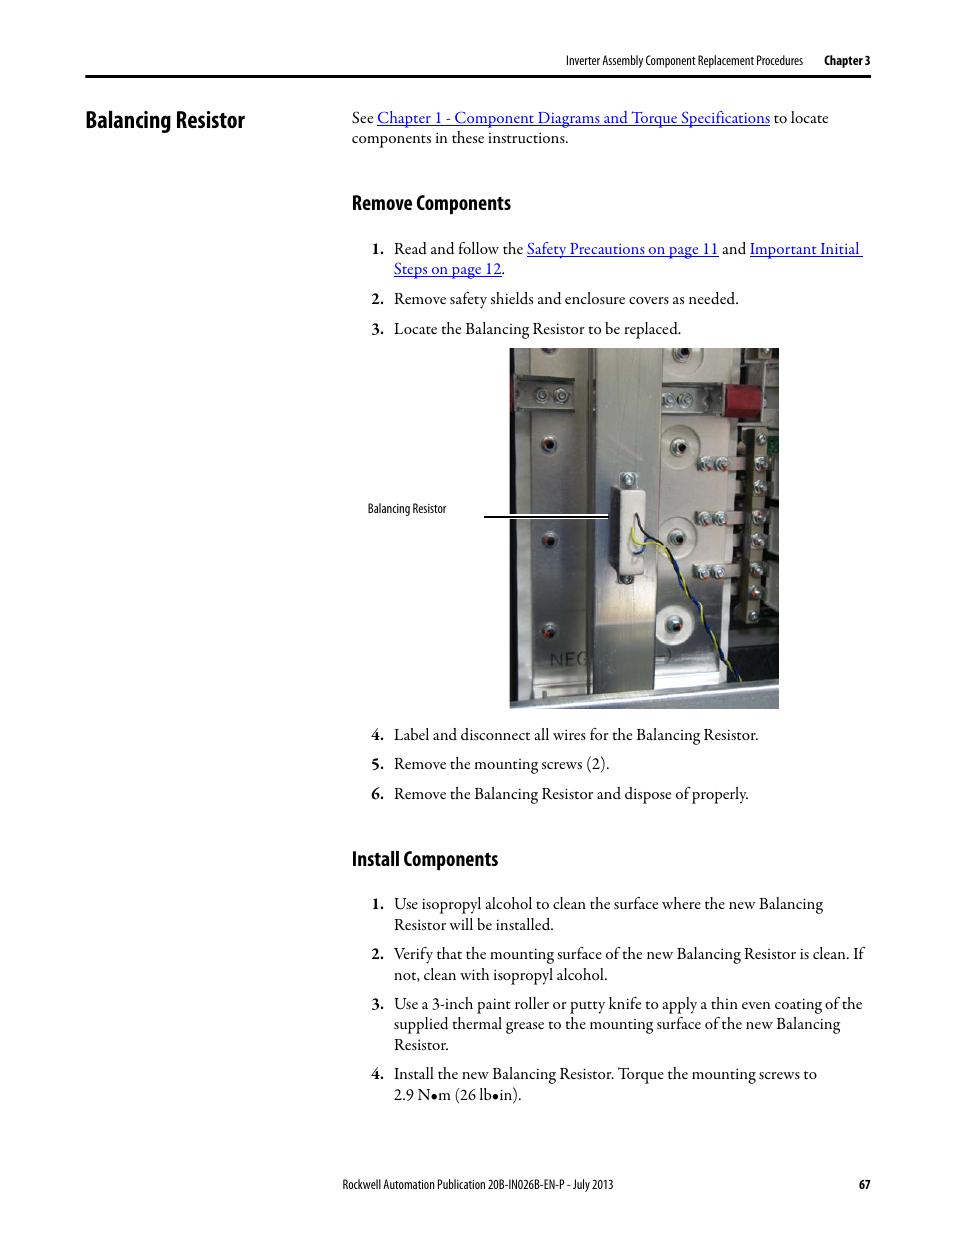 powerflex 700 drive frame 5 components replacement   Nakanak org